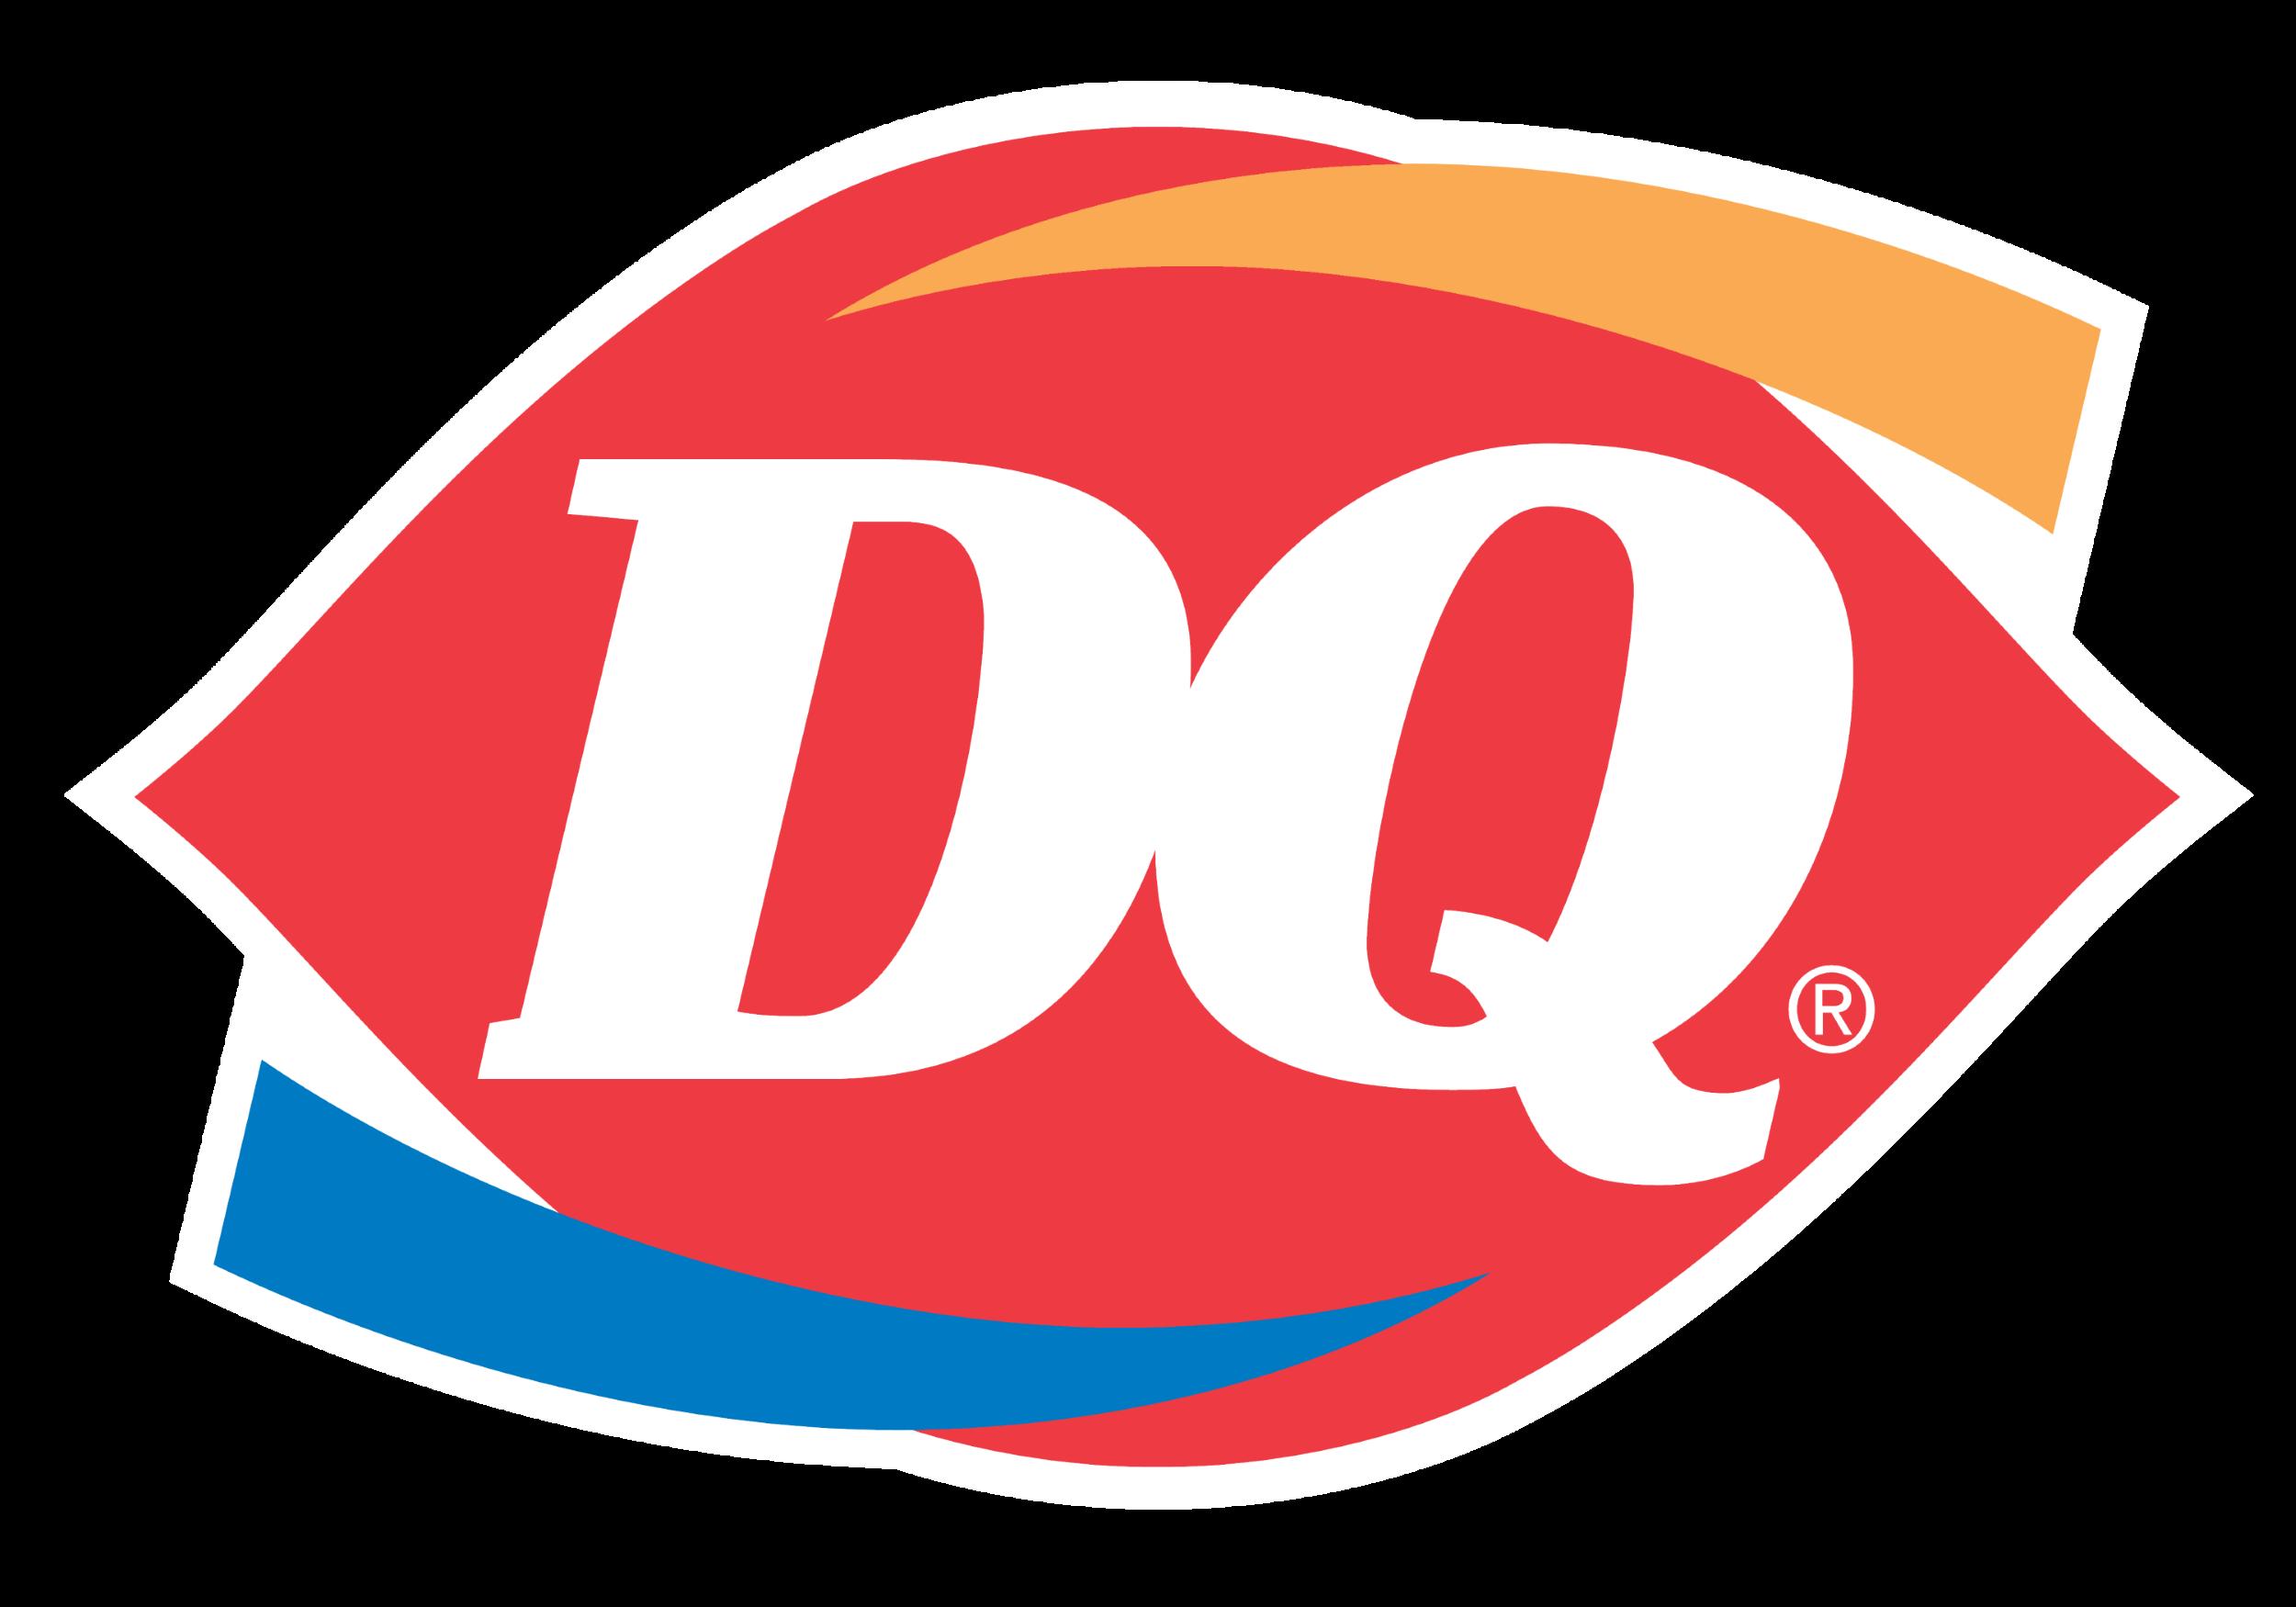 dq dairy queen logos download rh logos download com dairy logo design dairy logistics